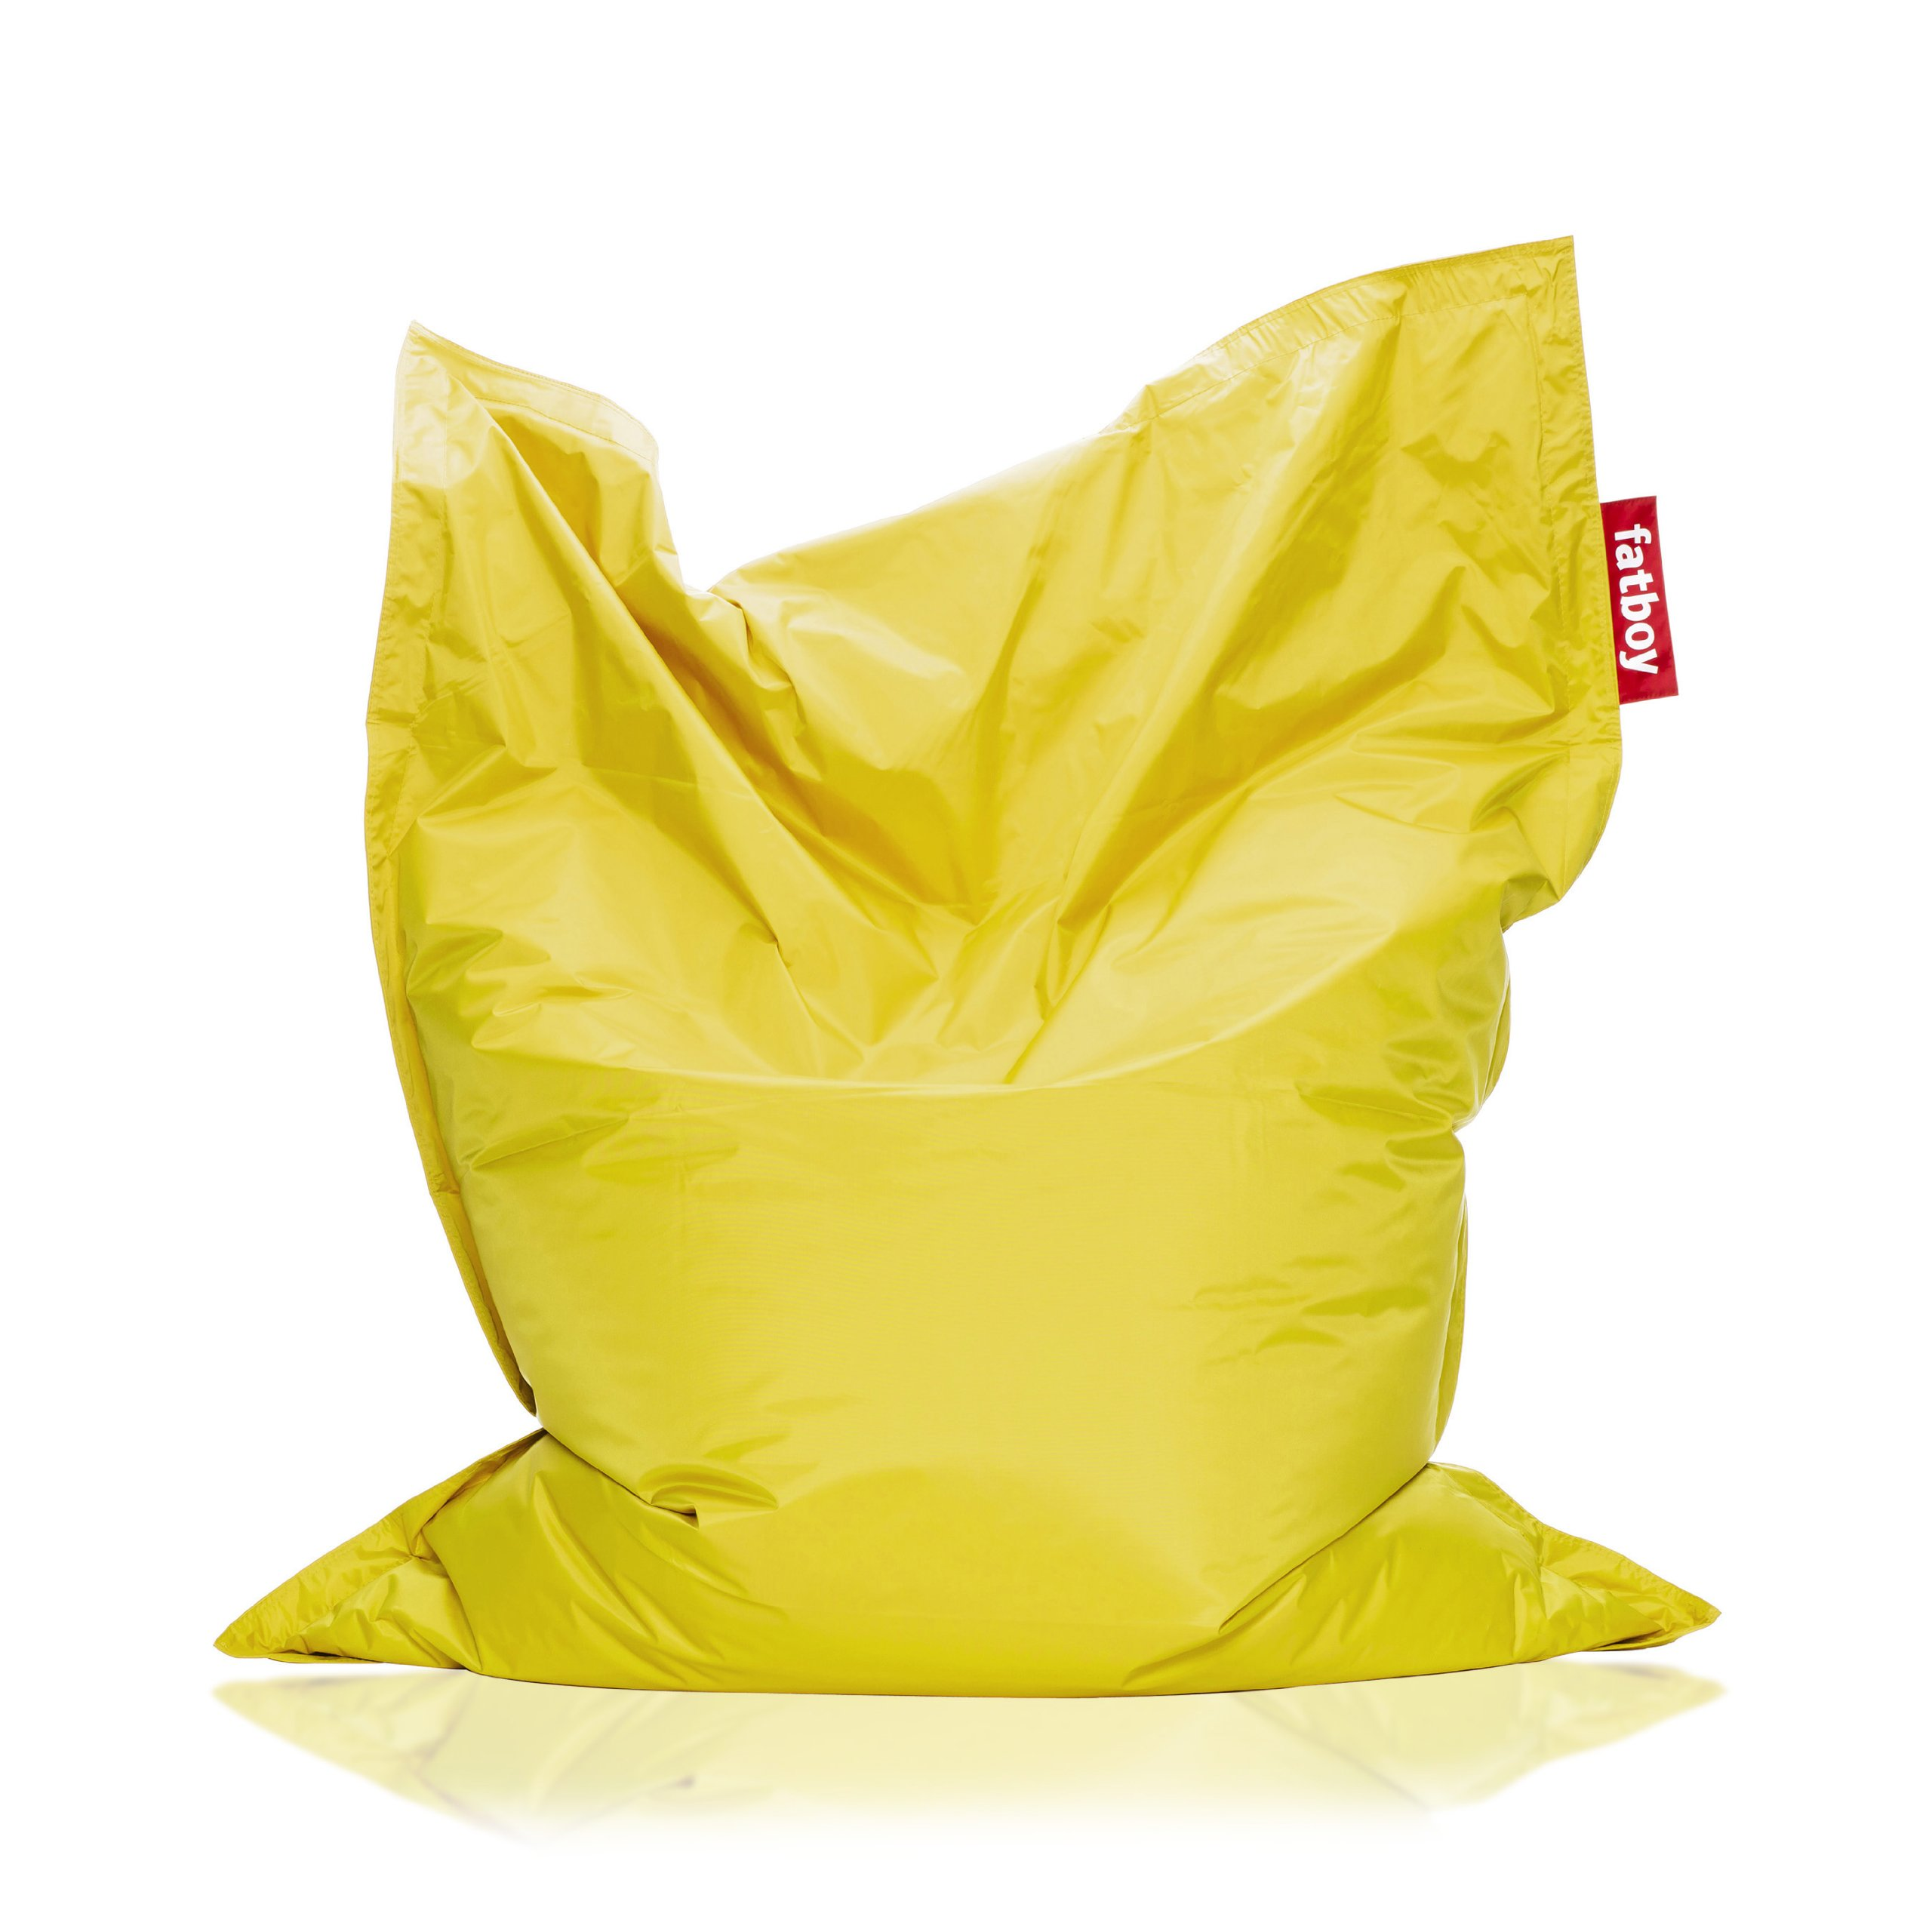 Fatboy The Original Bean Bag, Yellow